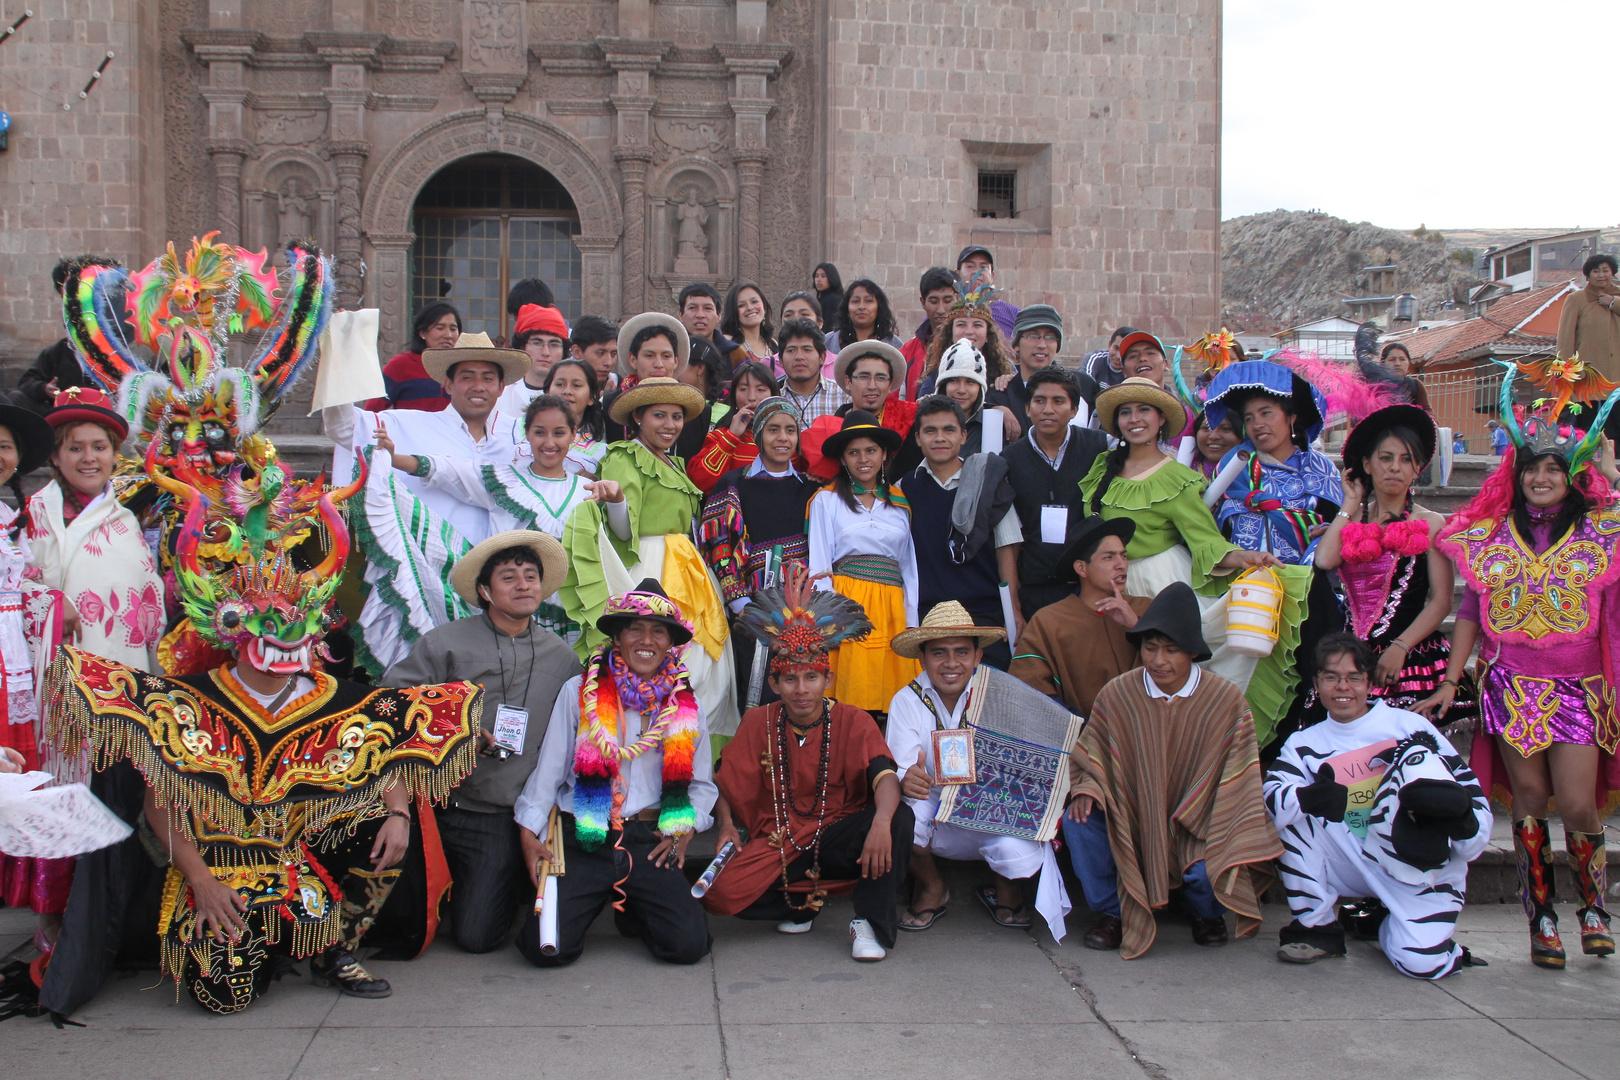 KARNEVAL Gruppe Peru